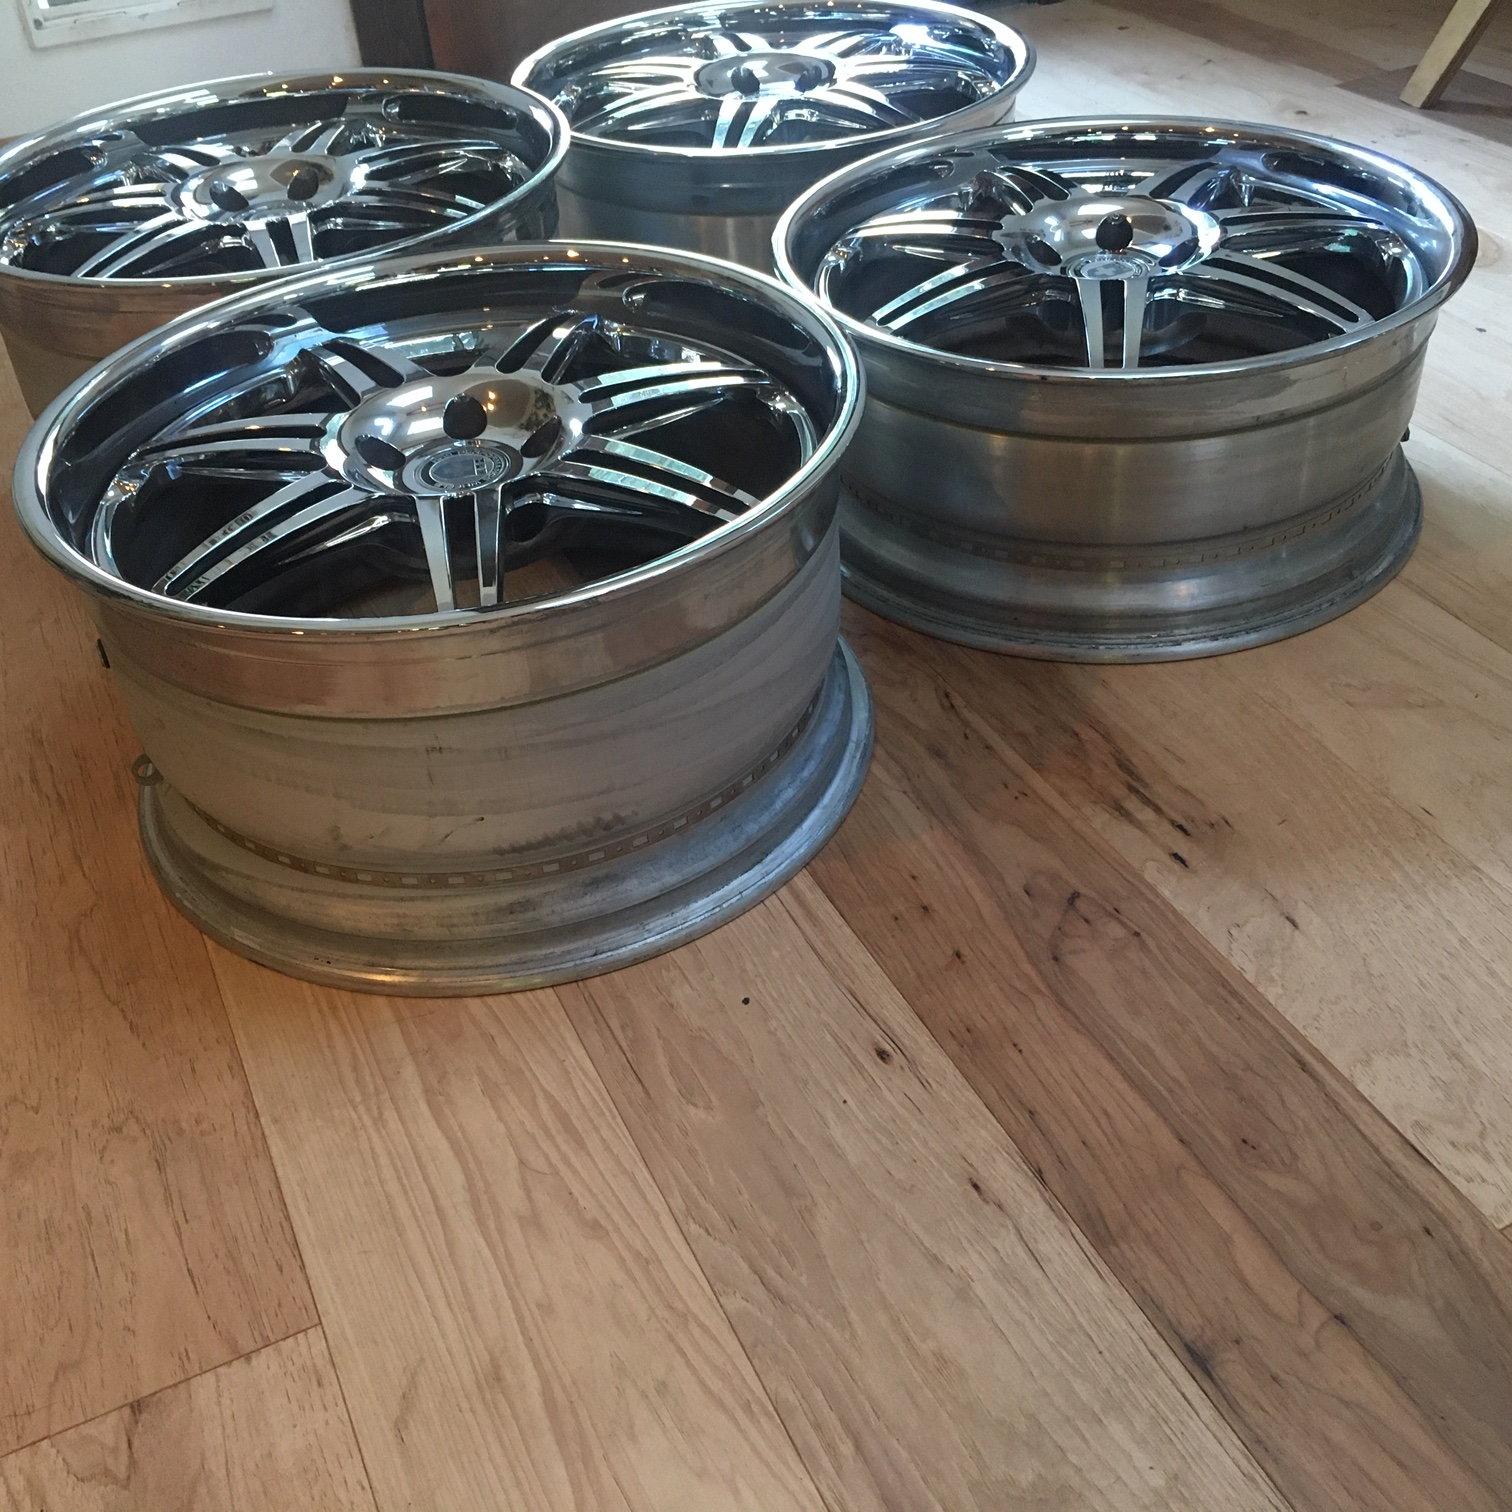 "Staggered 21"" HRE Aston Martin Wheels 21x9 21x10.5"